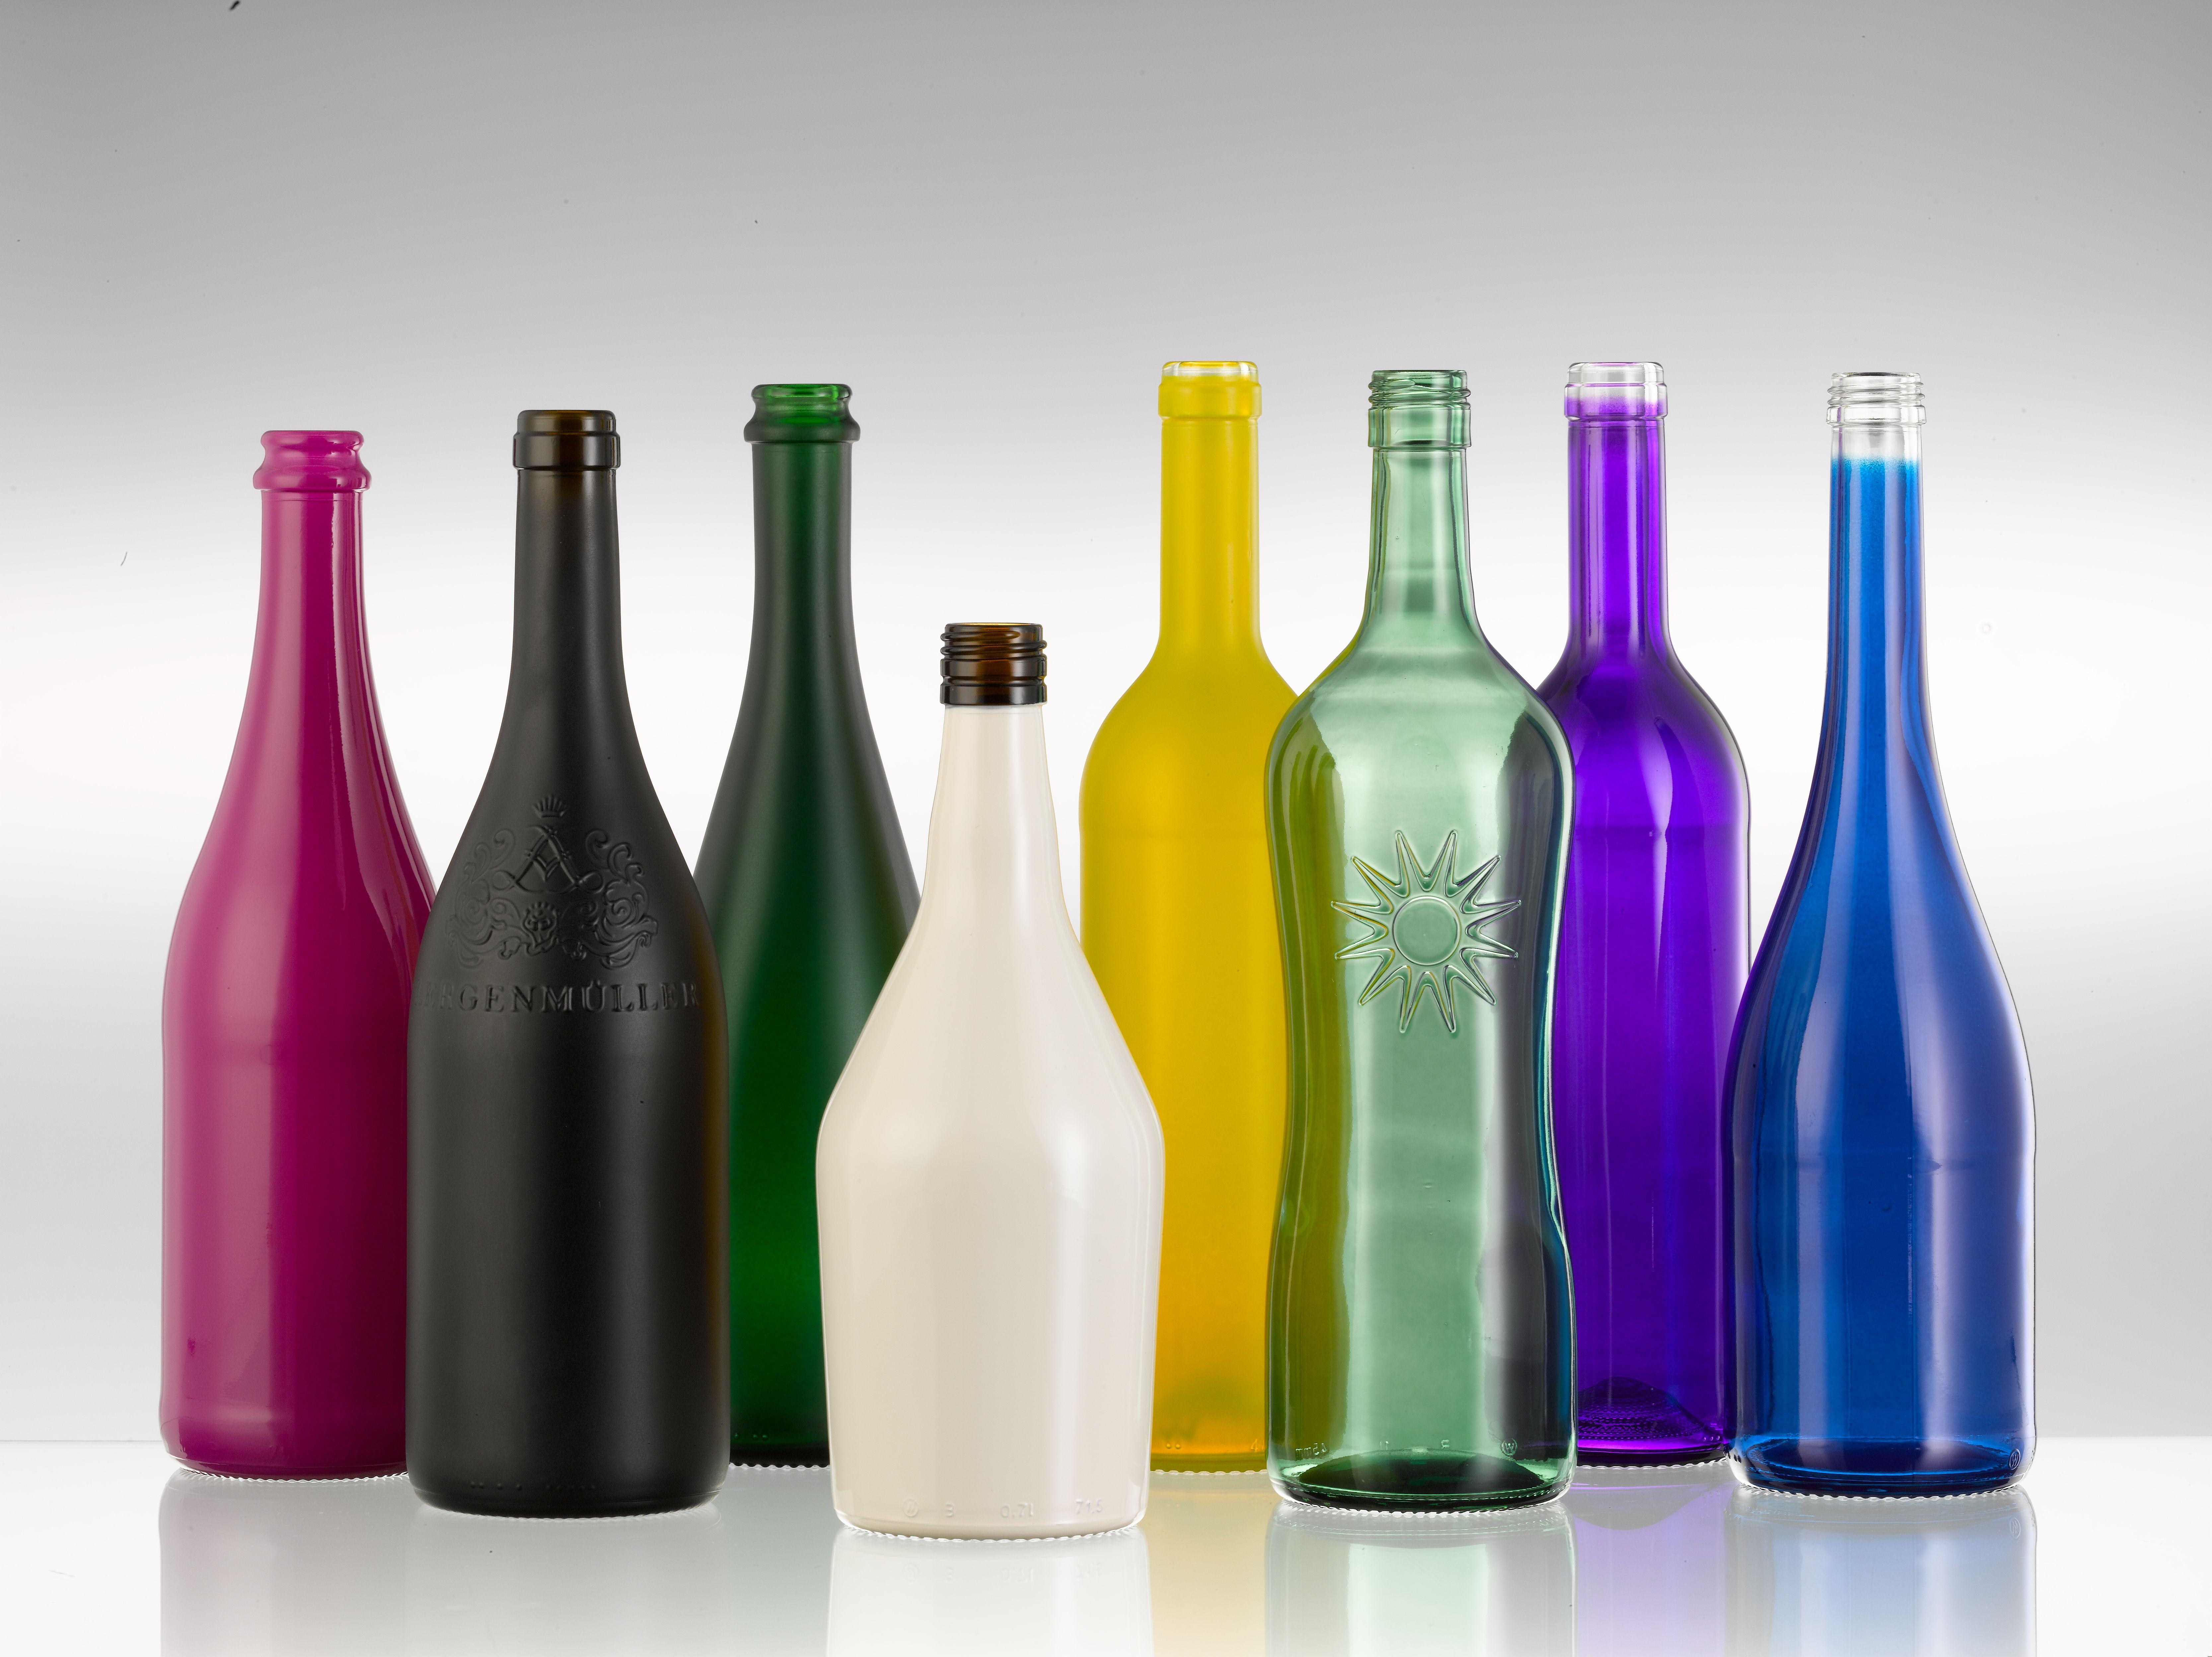 6666x4992 > Bottles Wallpapers